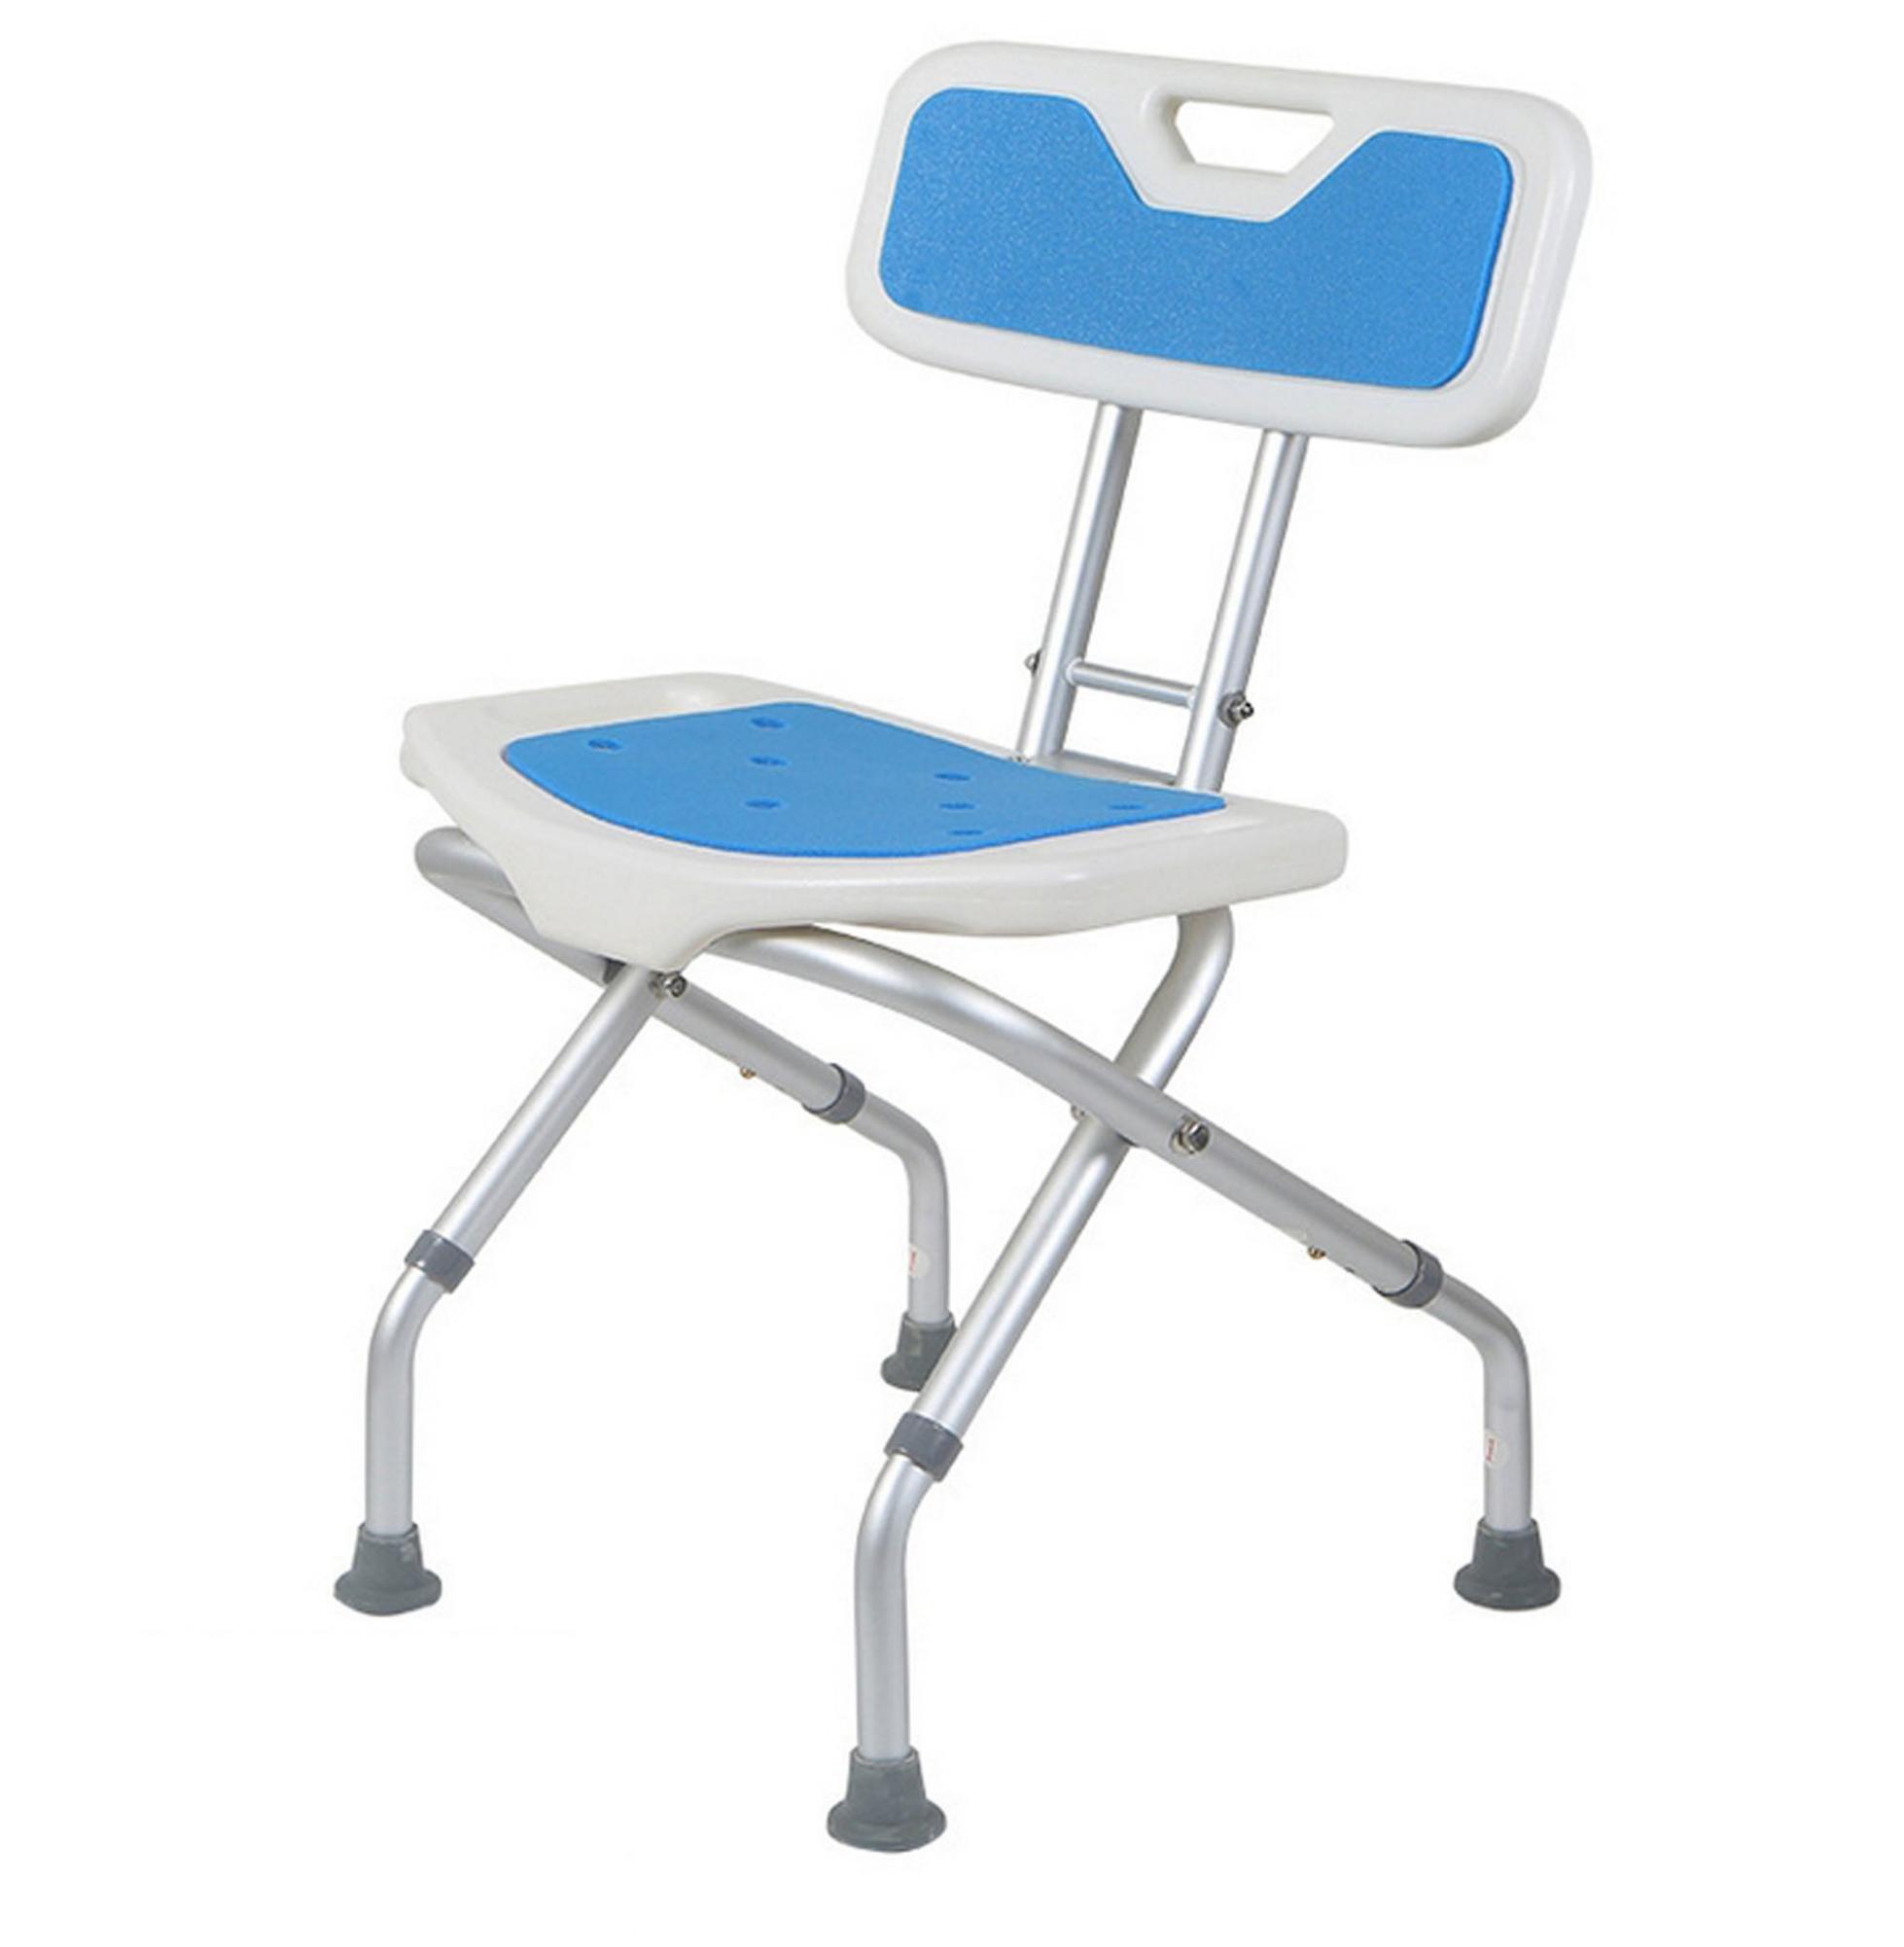 GAOJIAN Elderly collapsible Bathing chair home anti-slipping elderly disabled pregnant women folding stool adjustable height maximum bearing capacity 136kg